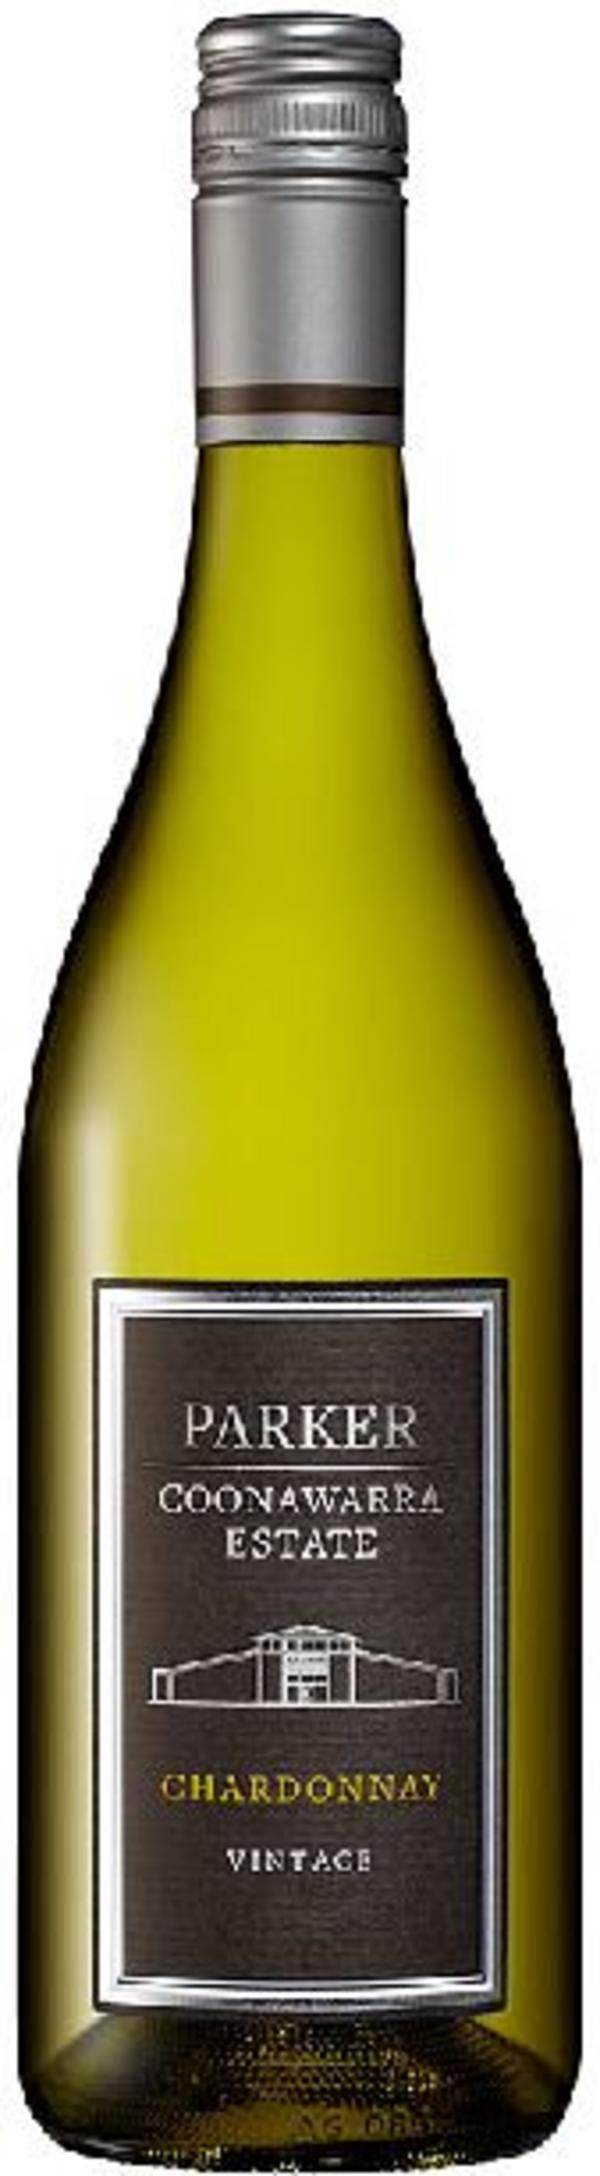 Parker Coonawarra Series Chardonnay 2016.